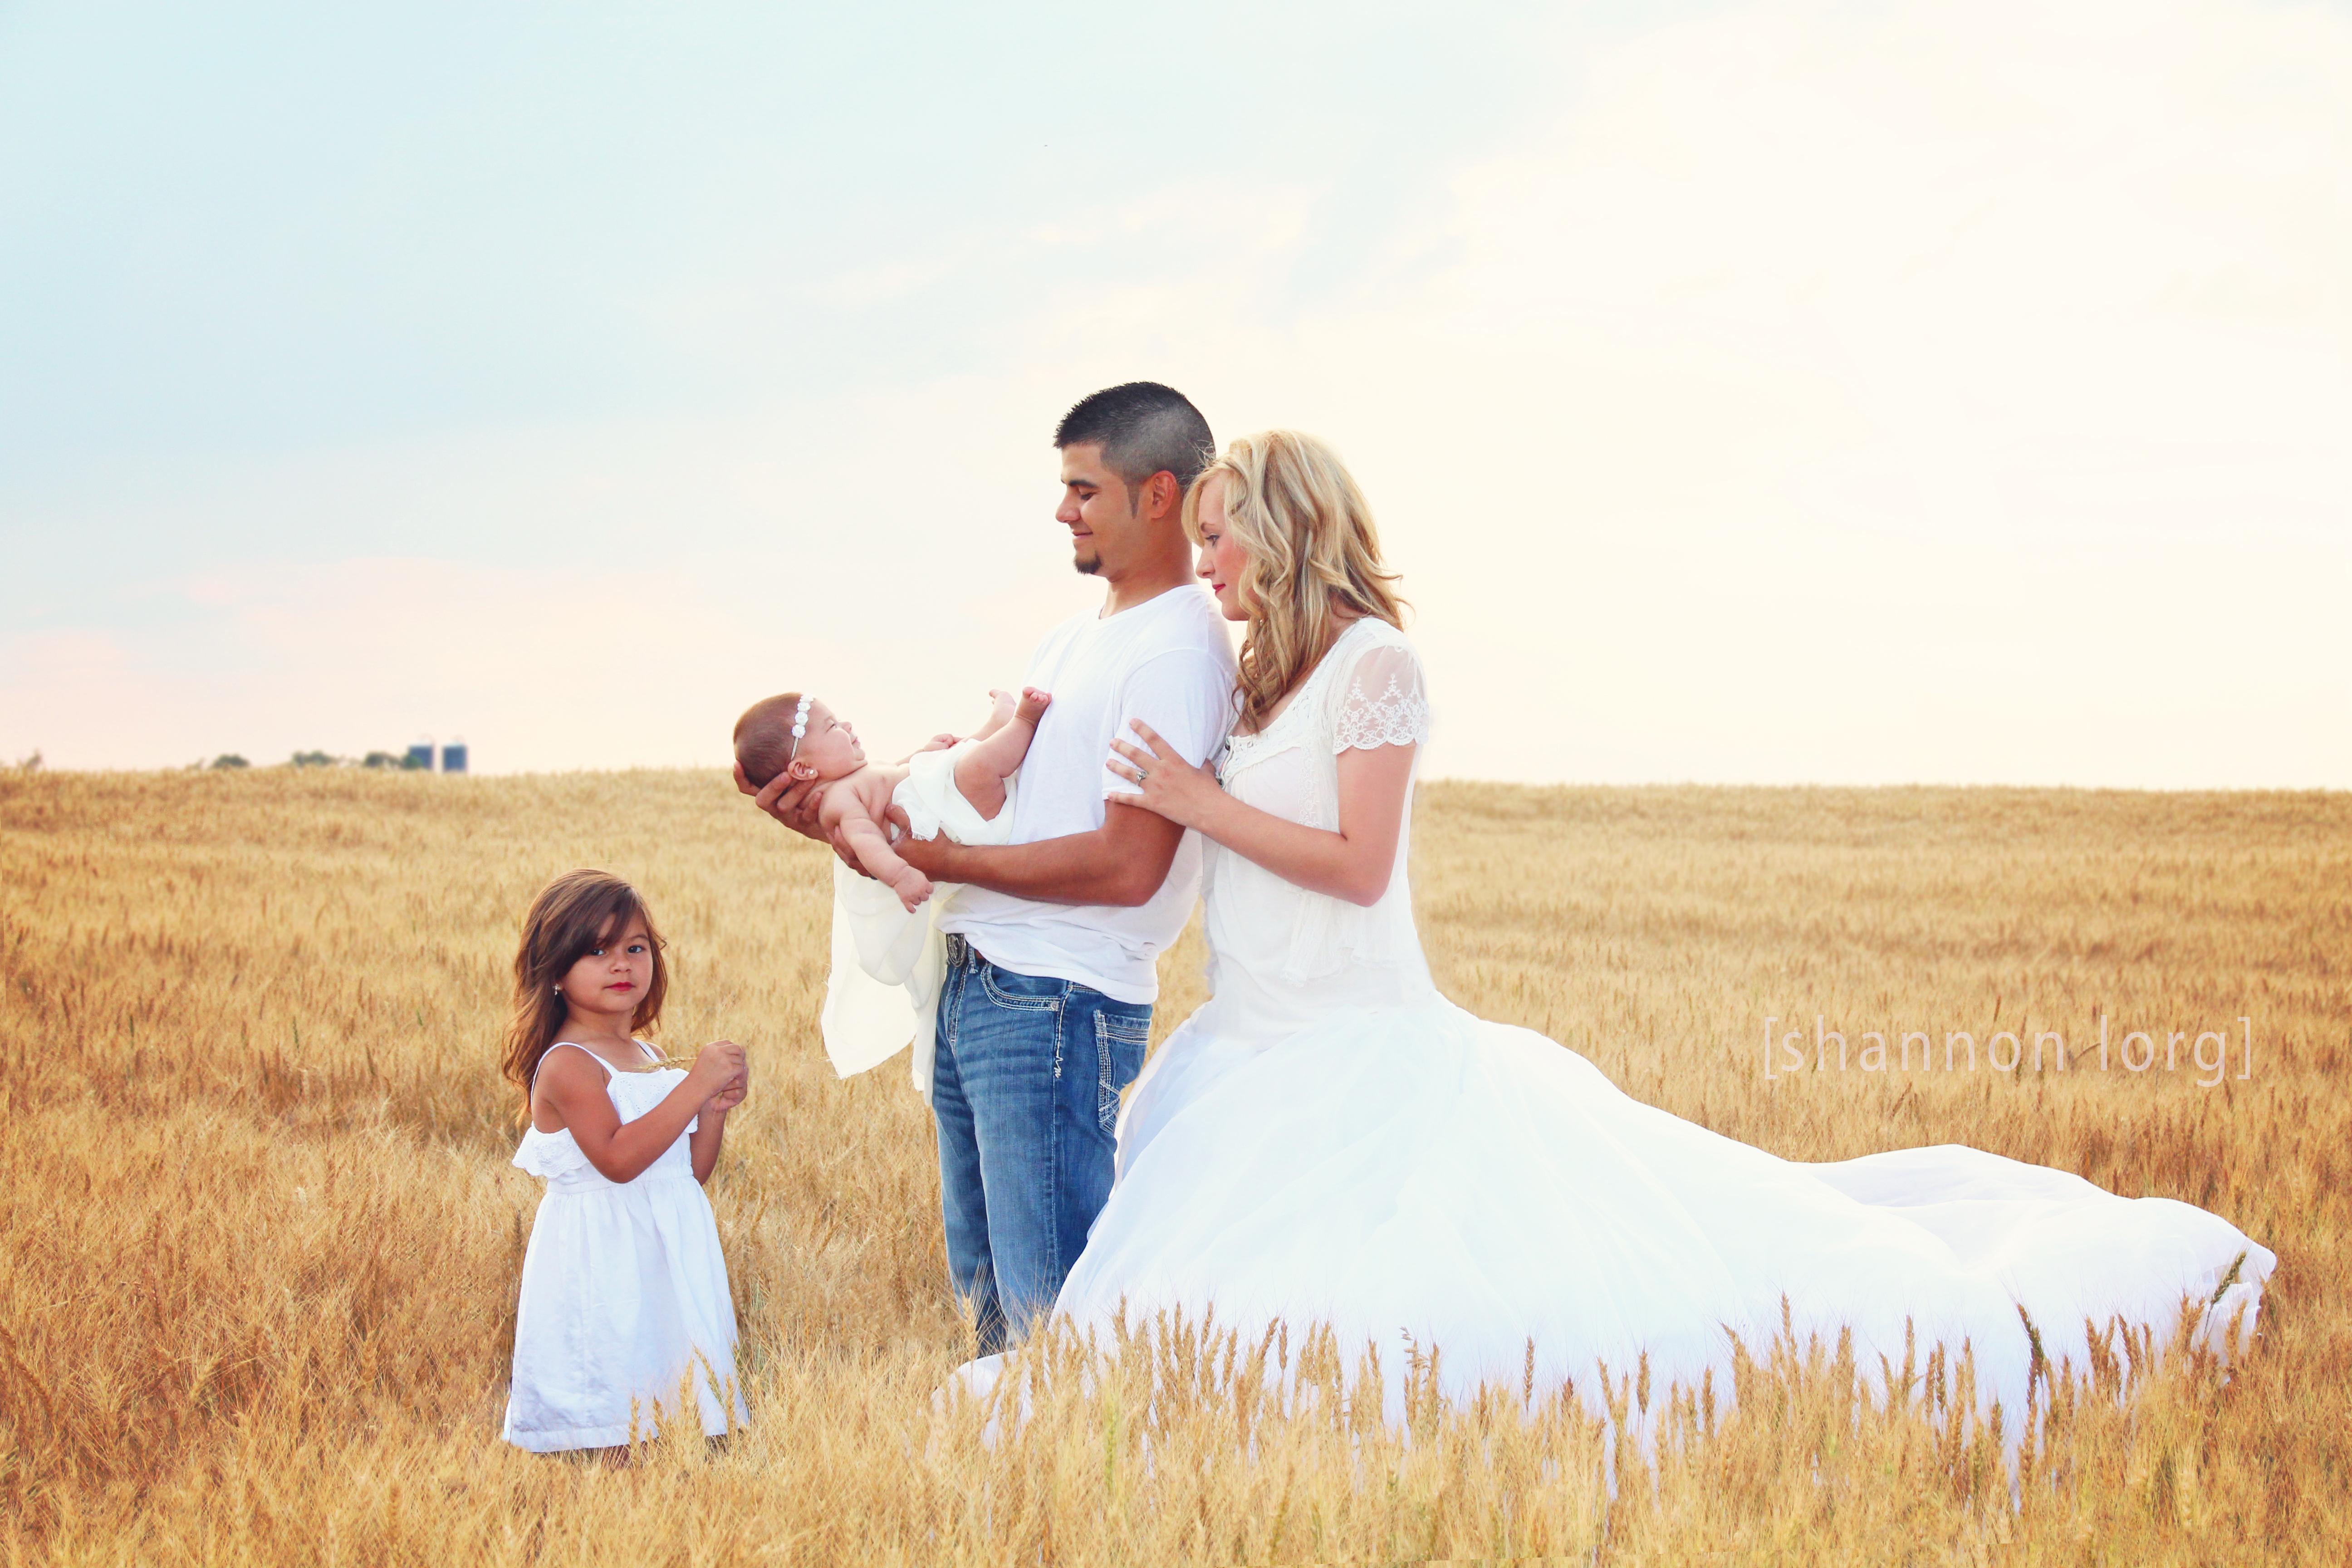 A Vintage Wedding Dress And An Oklahoma Wheat Field